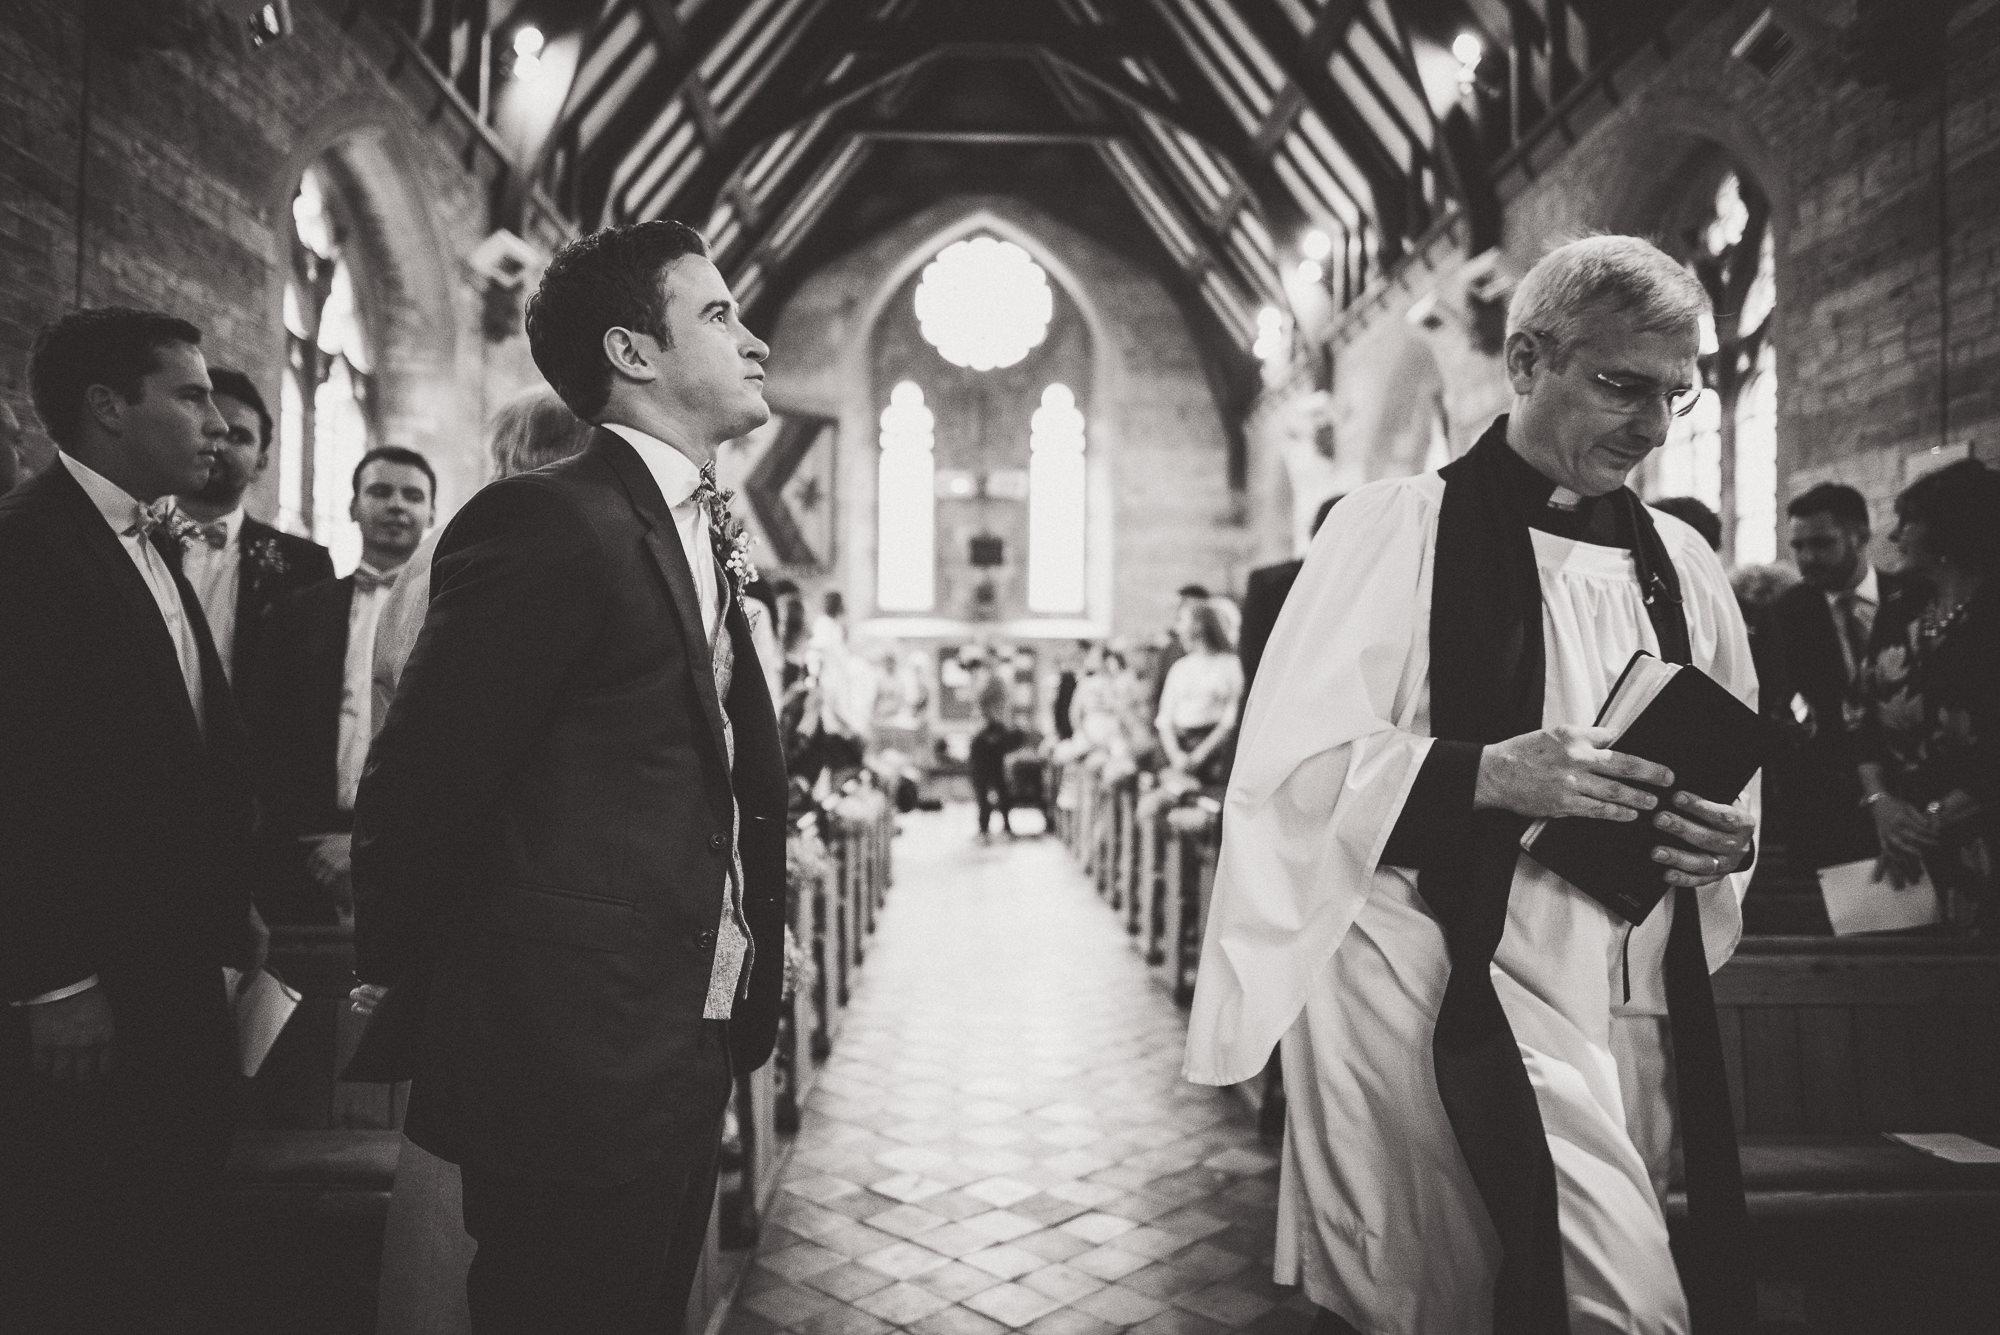 Veils & Bales Wedding Photography | Charlie & Steve SCSS 066